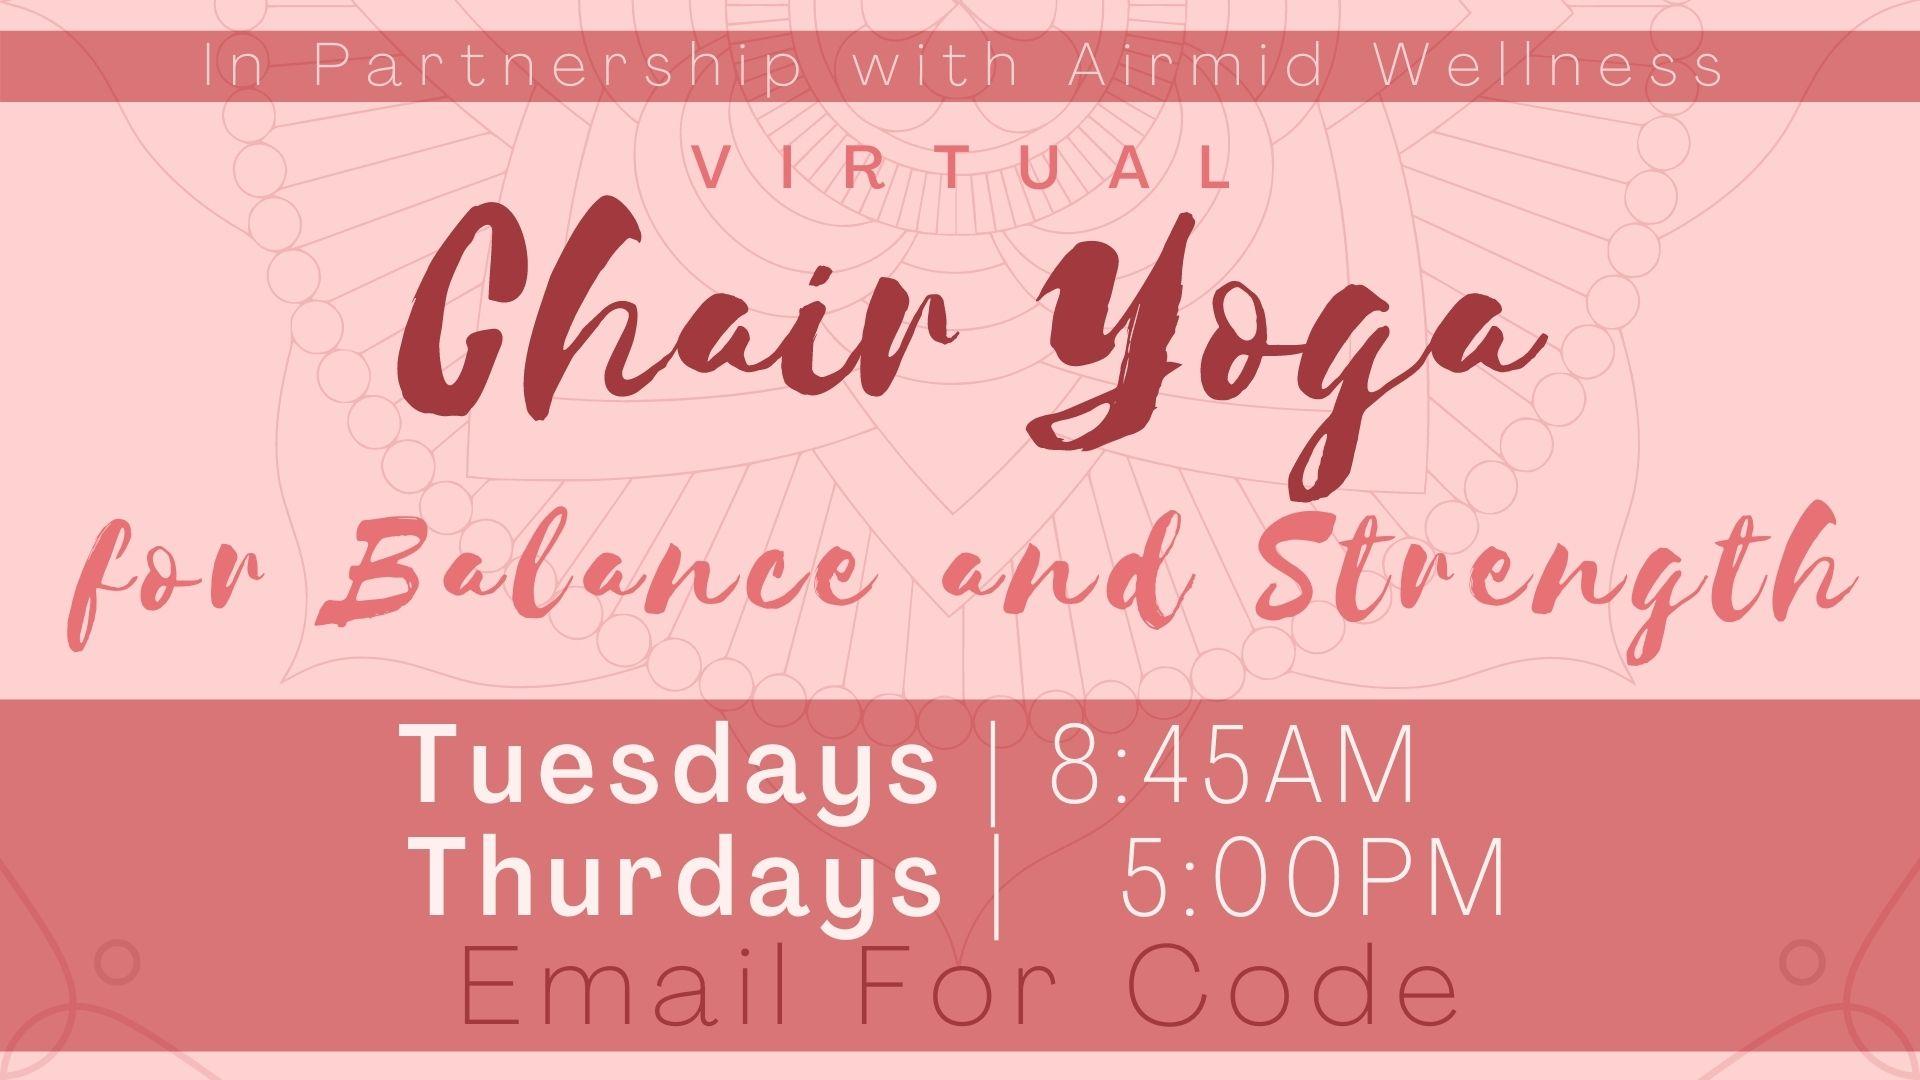 Chair Yoga for Balance and Strength